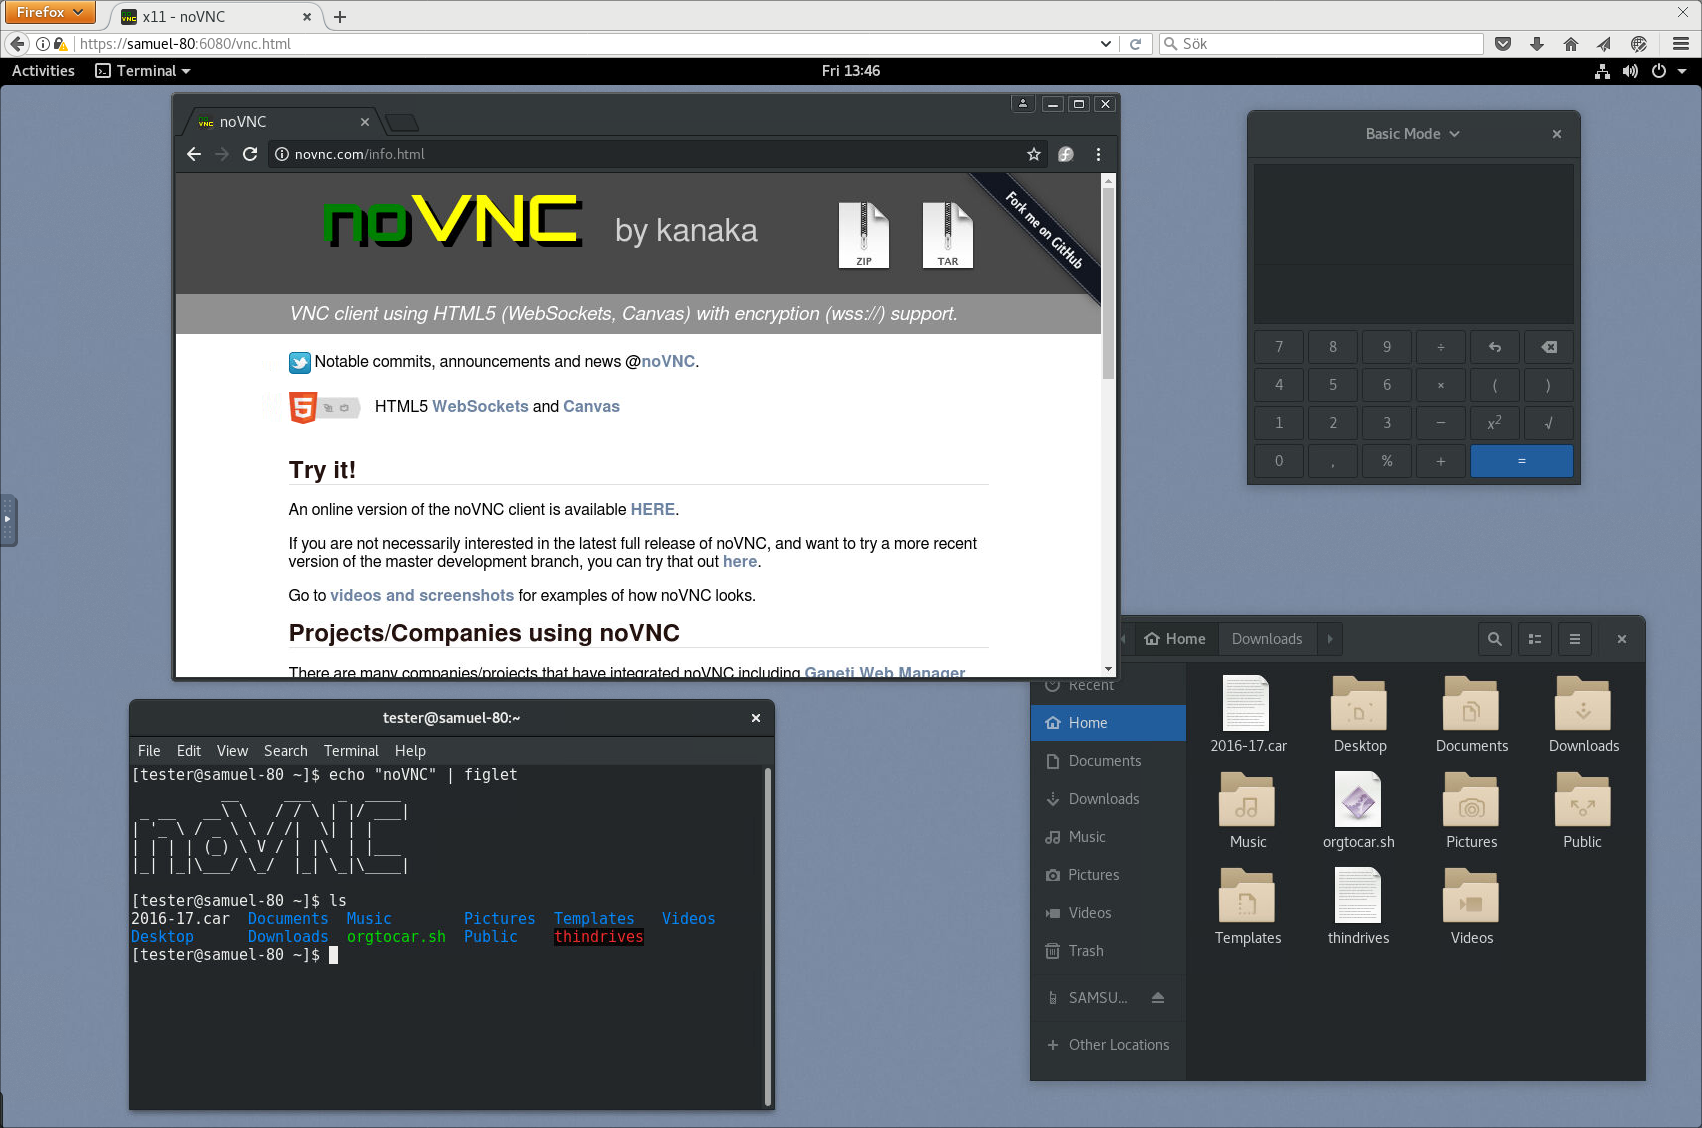 GitHub - novnc/noVNC: VNC client using HTML5 (WebSockets, Canvas)